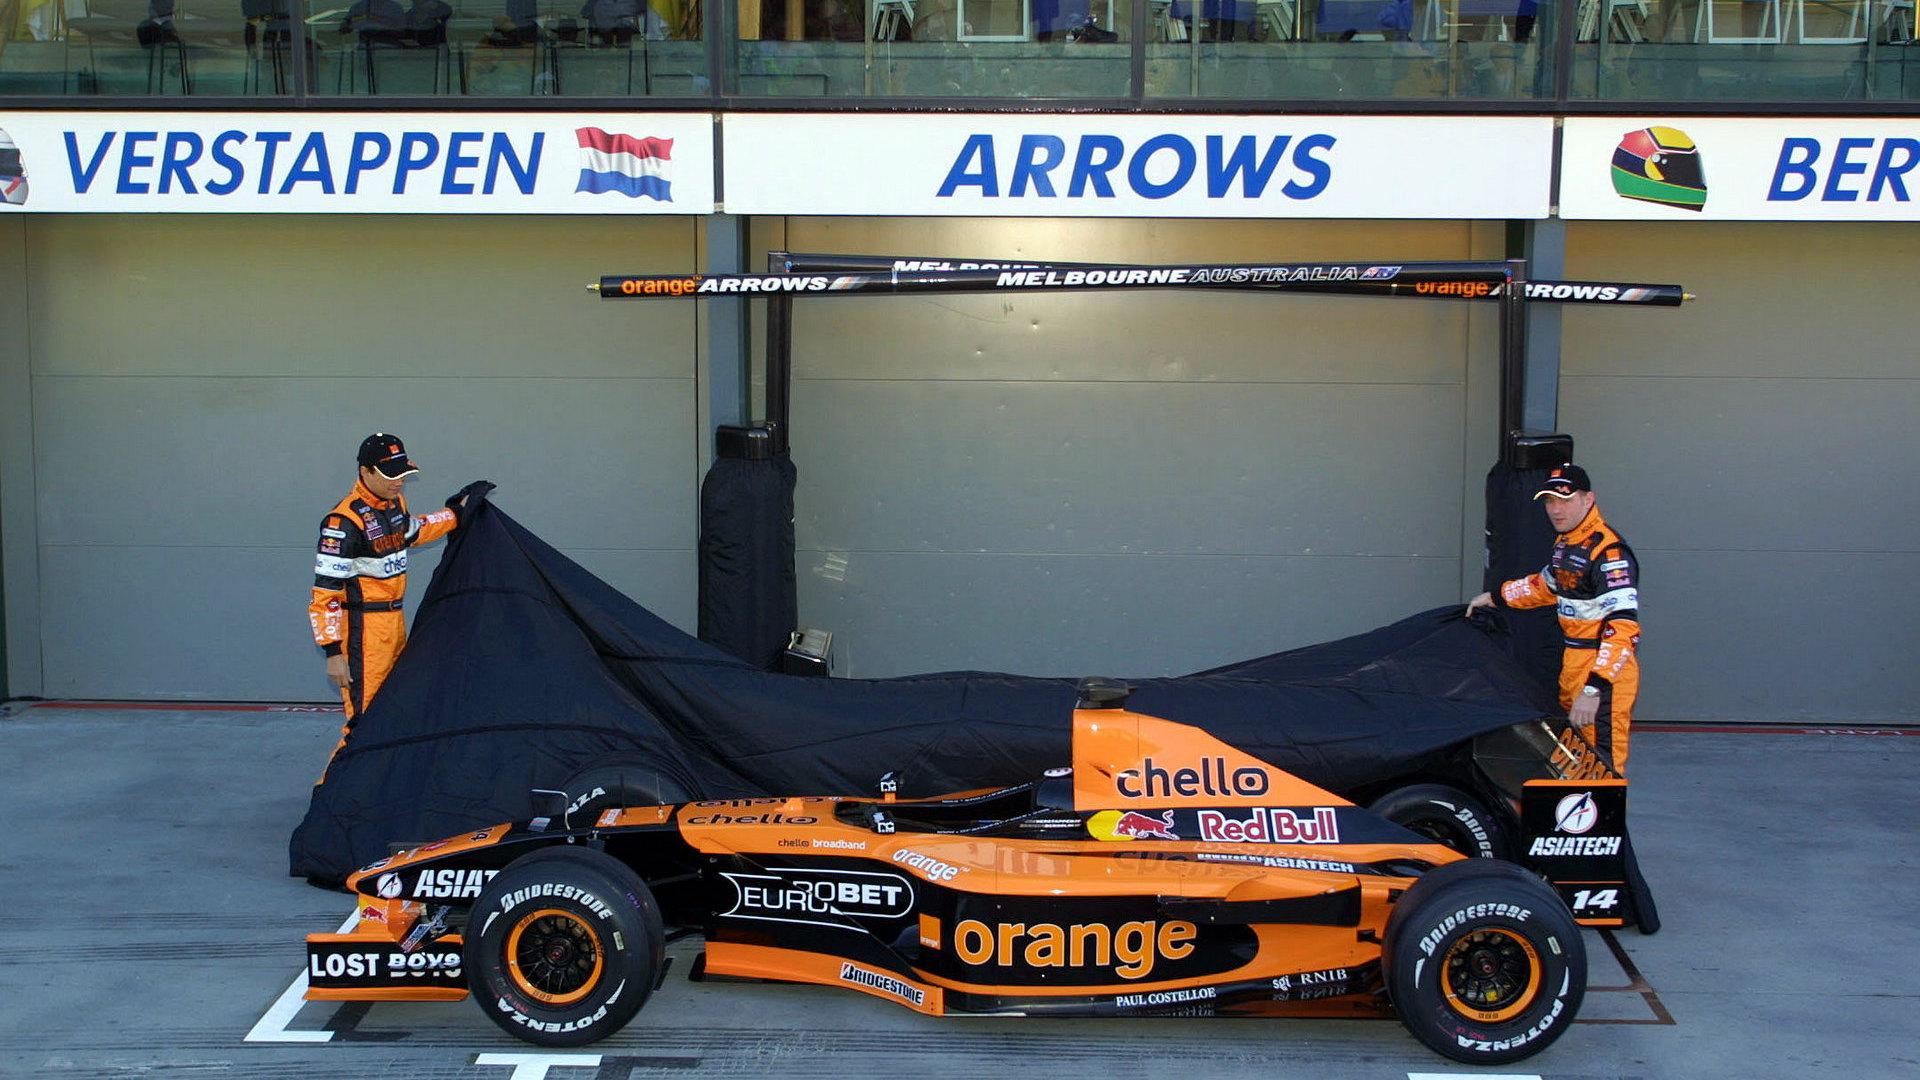 Hd Wallpapers 2005 Formula 1 Car Launches: HD Wallpapers 2001 Formula 1 Car Launches